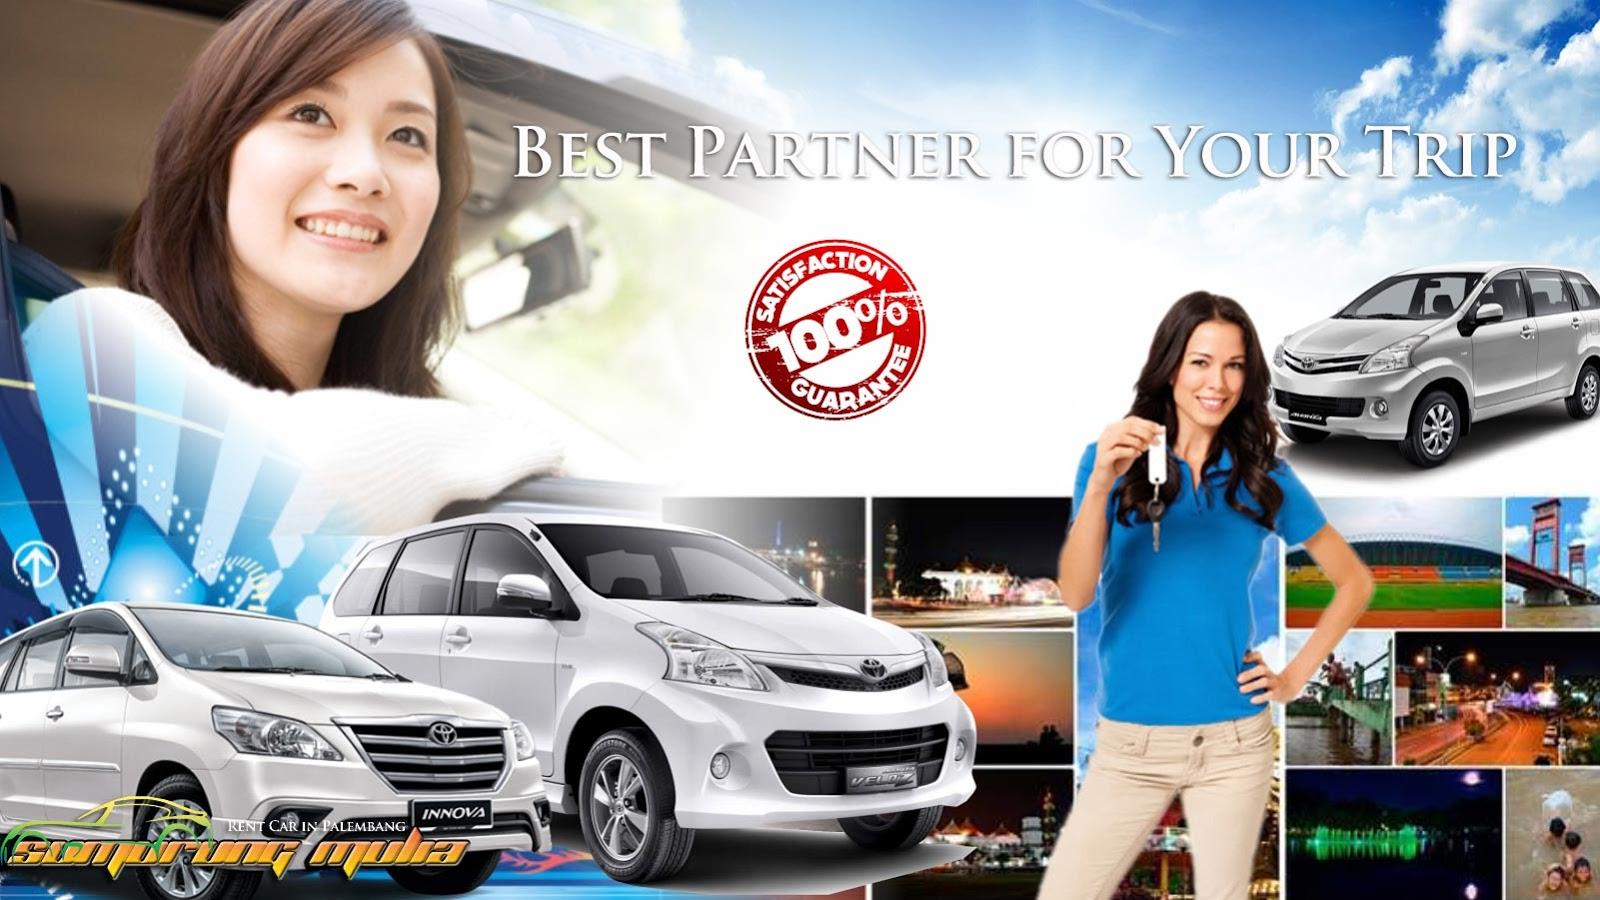 sewa mobil murah palembang, rentcar in palembang